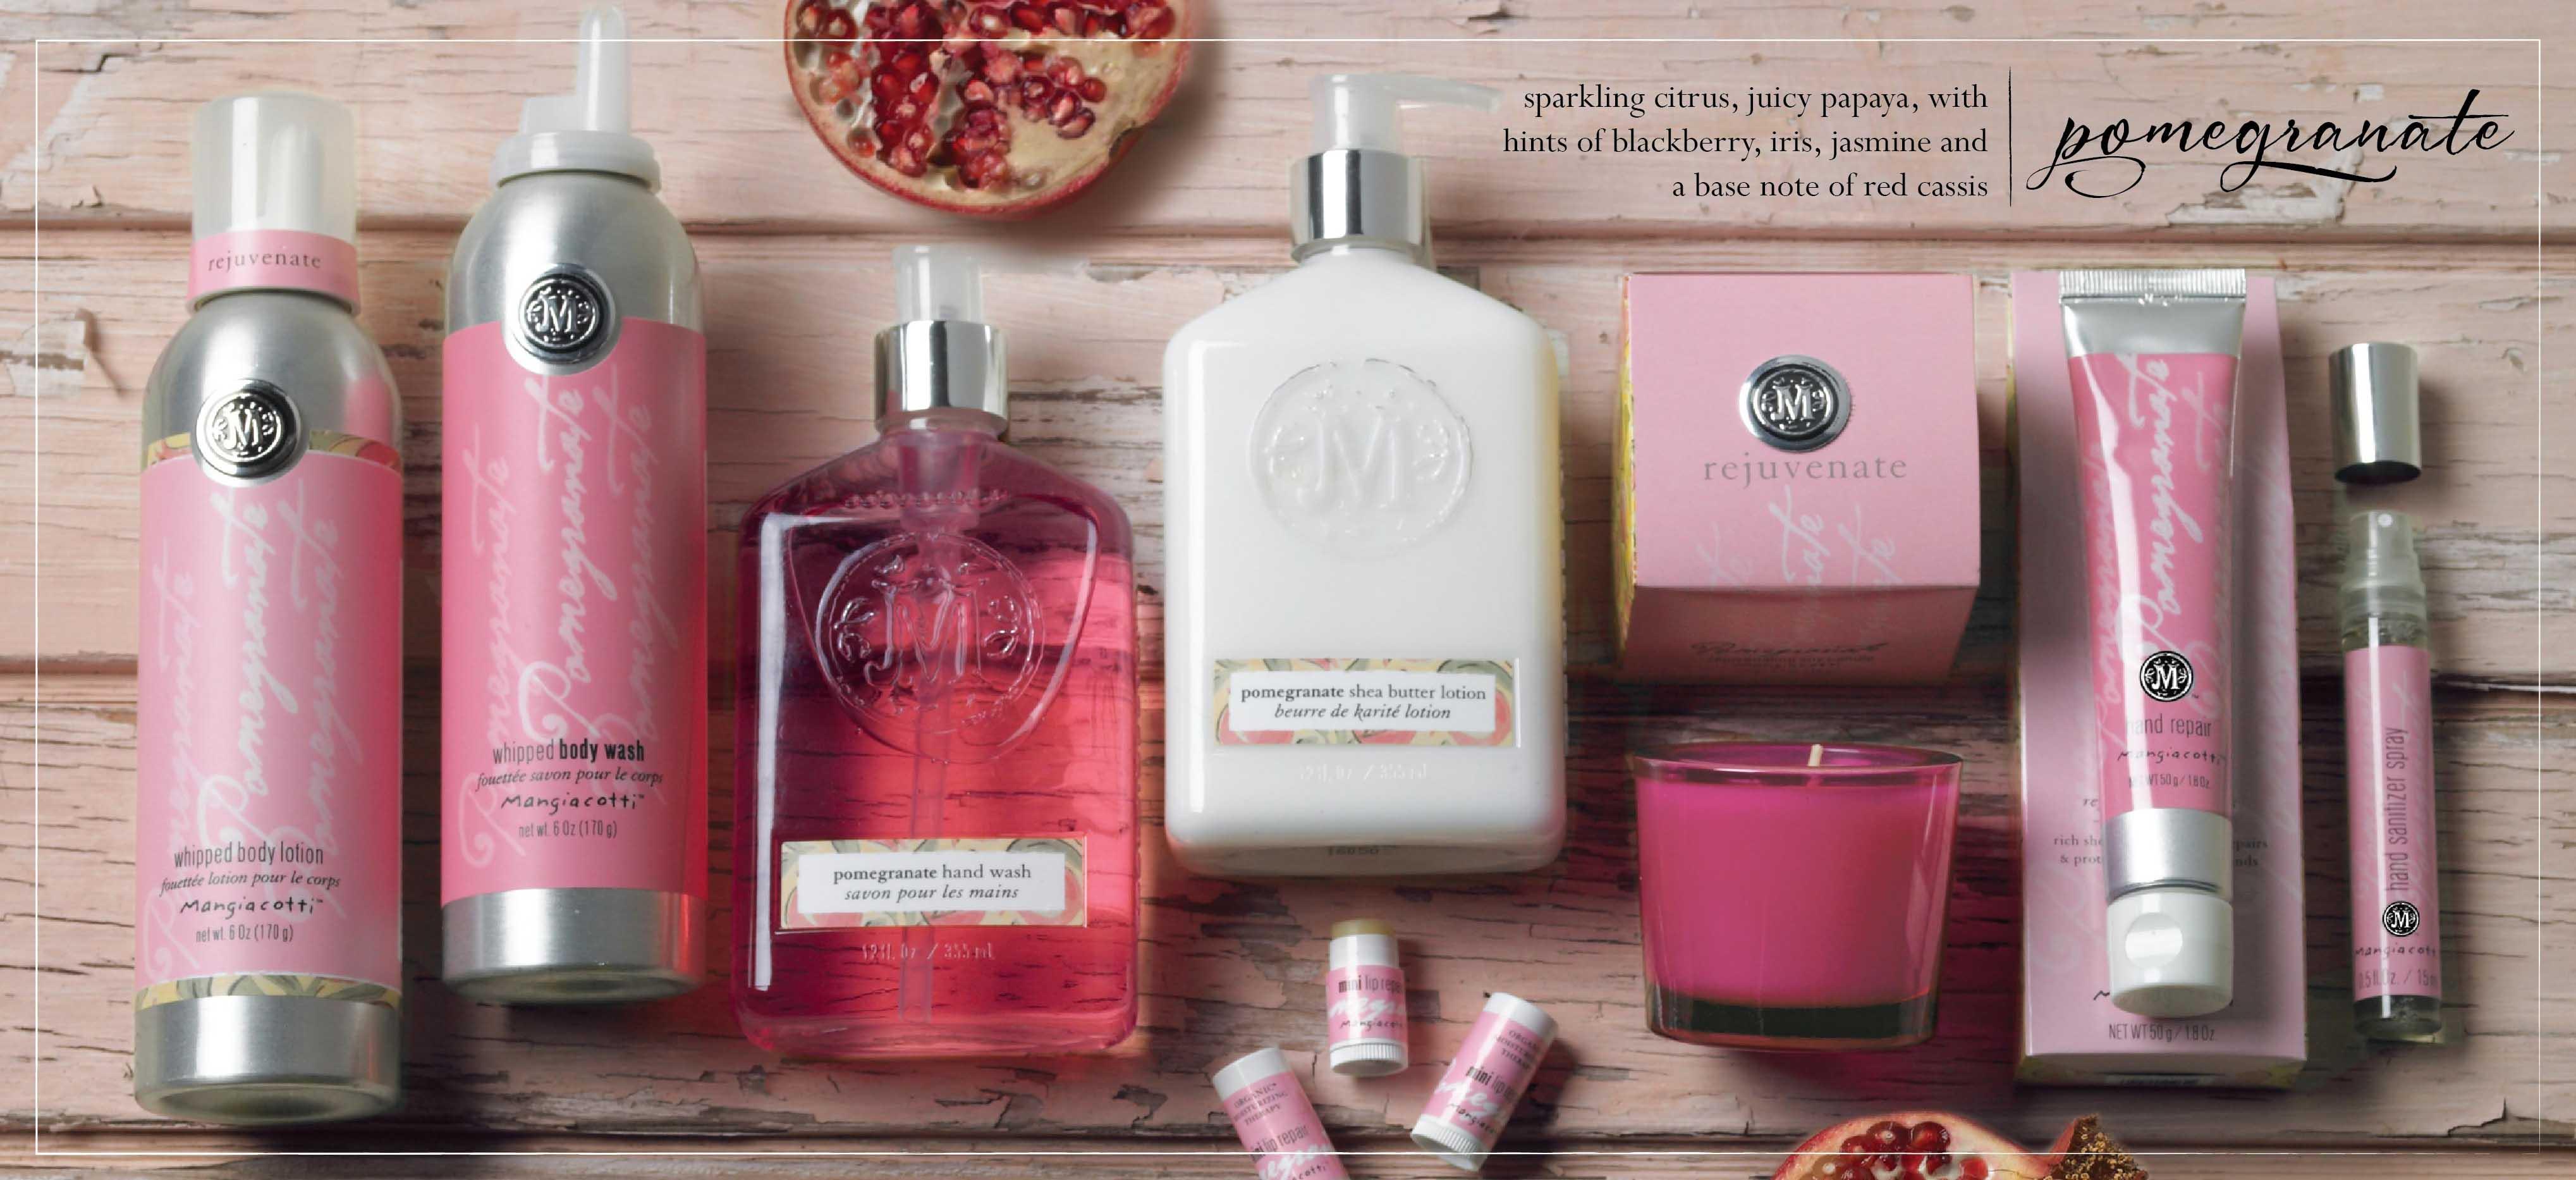 pomegranate-web-fragrance2.jpg